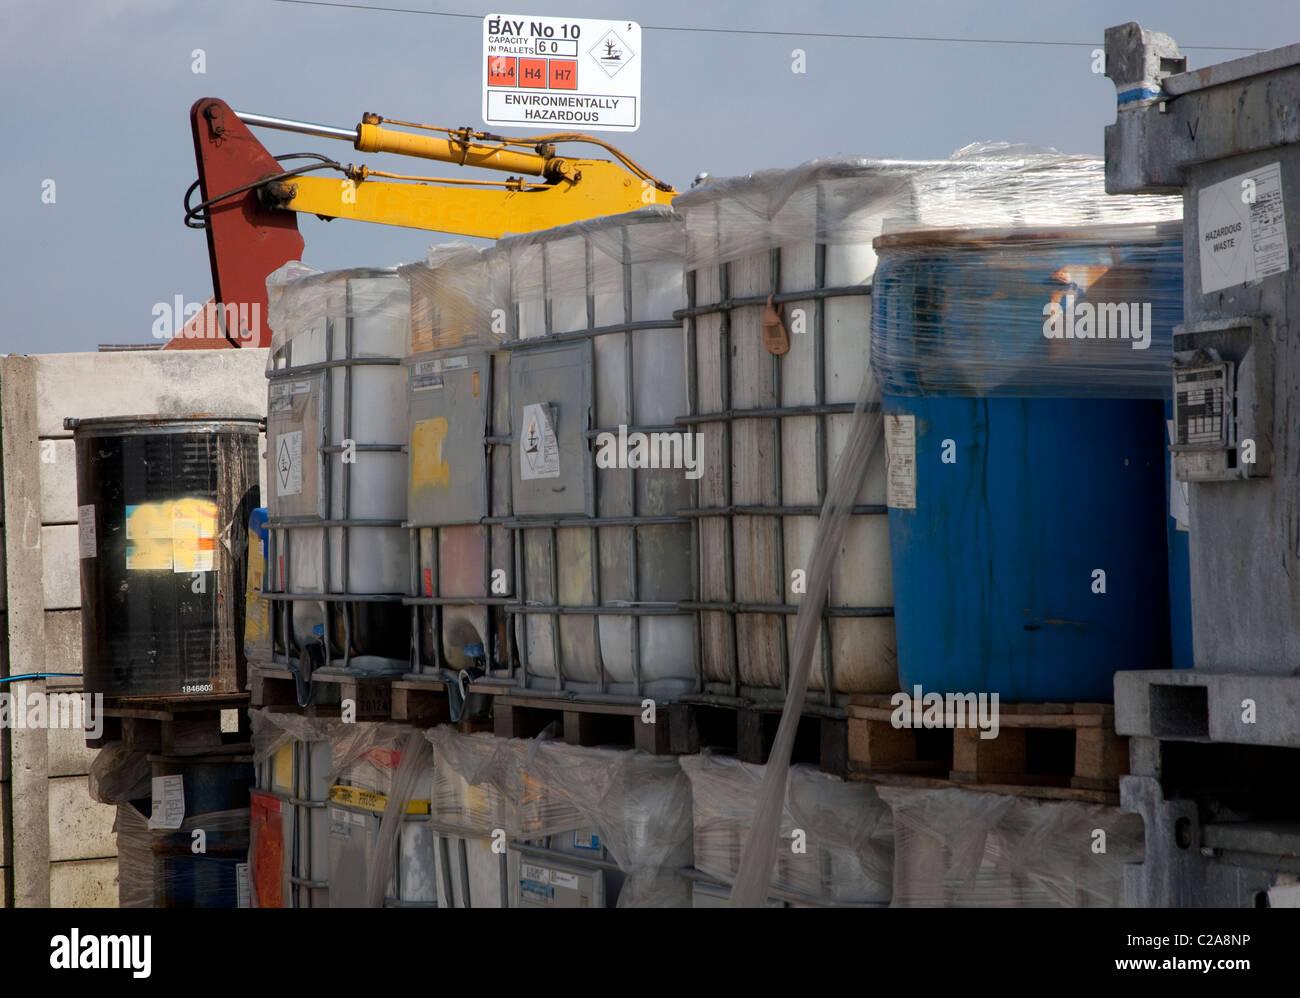 Hazardous waste store on industrial treatment plant, England - Stock Image